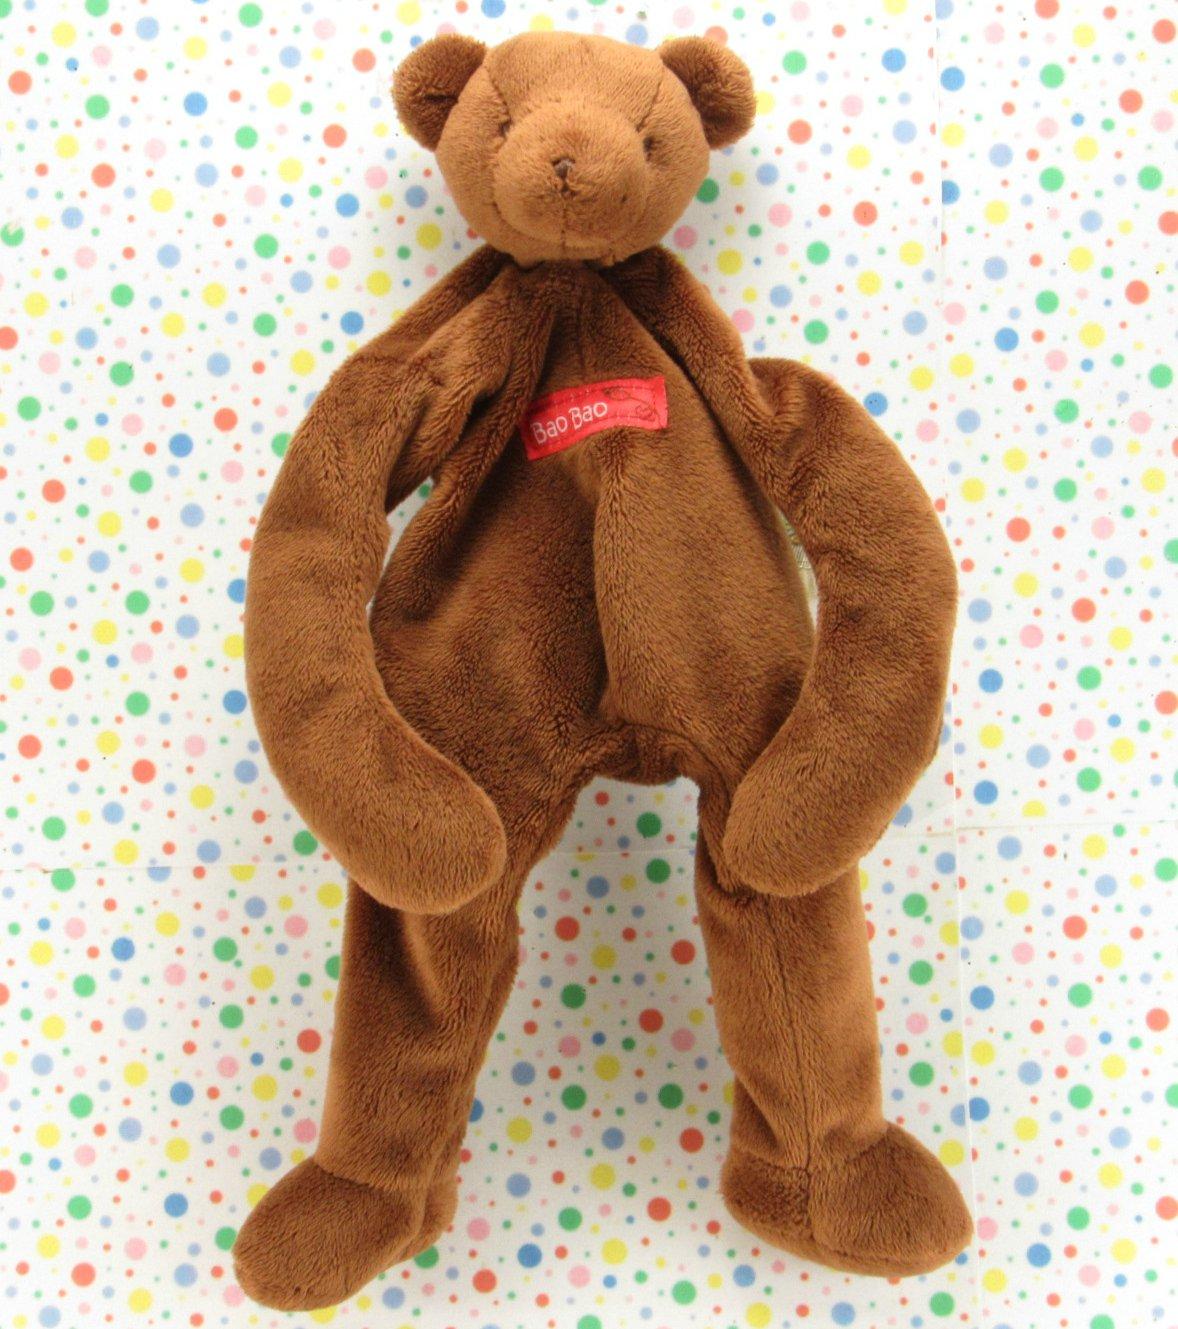 Bunnies by The Bay Silly Buddy Bao Bao  Bear Baby Toy Plush Lovey